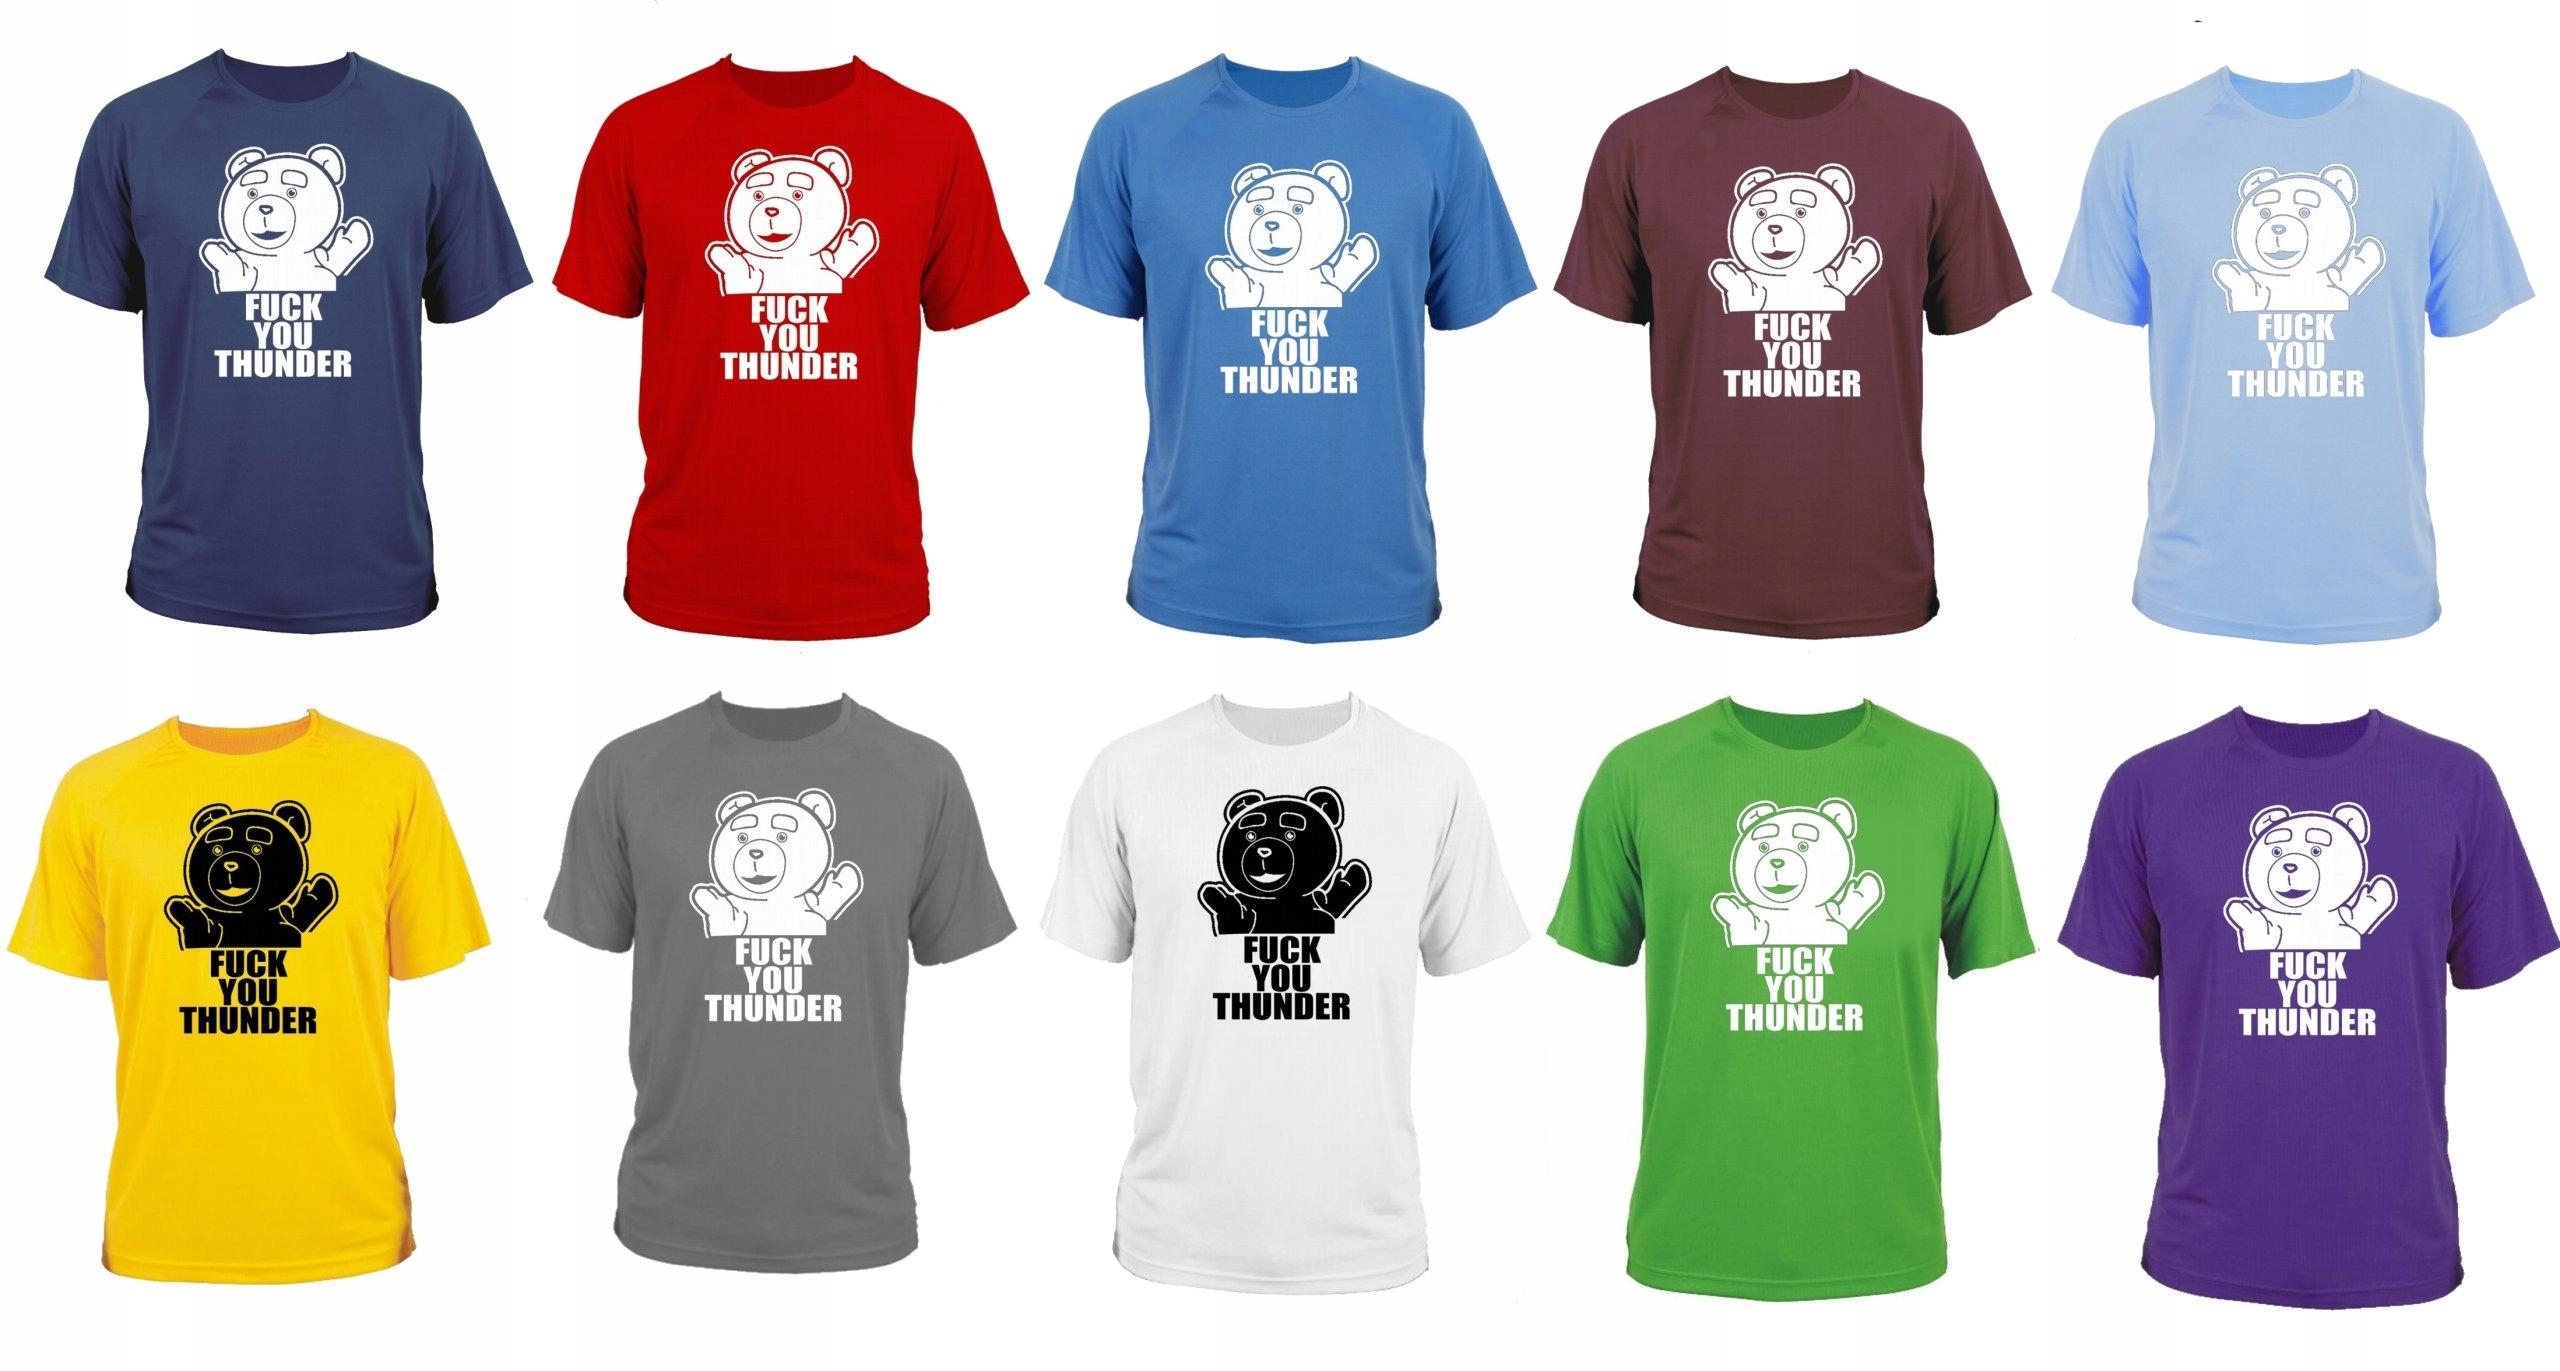 e1cbecfdbaf86c koszulka t-shirt Ted | fuck you thunder L - 7390361401 - oficjalne ...